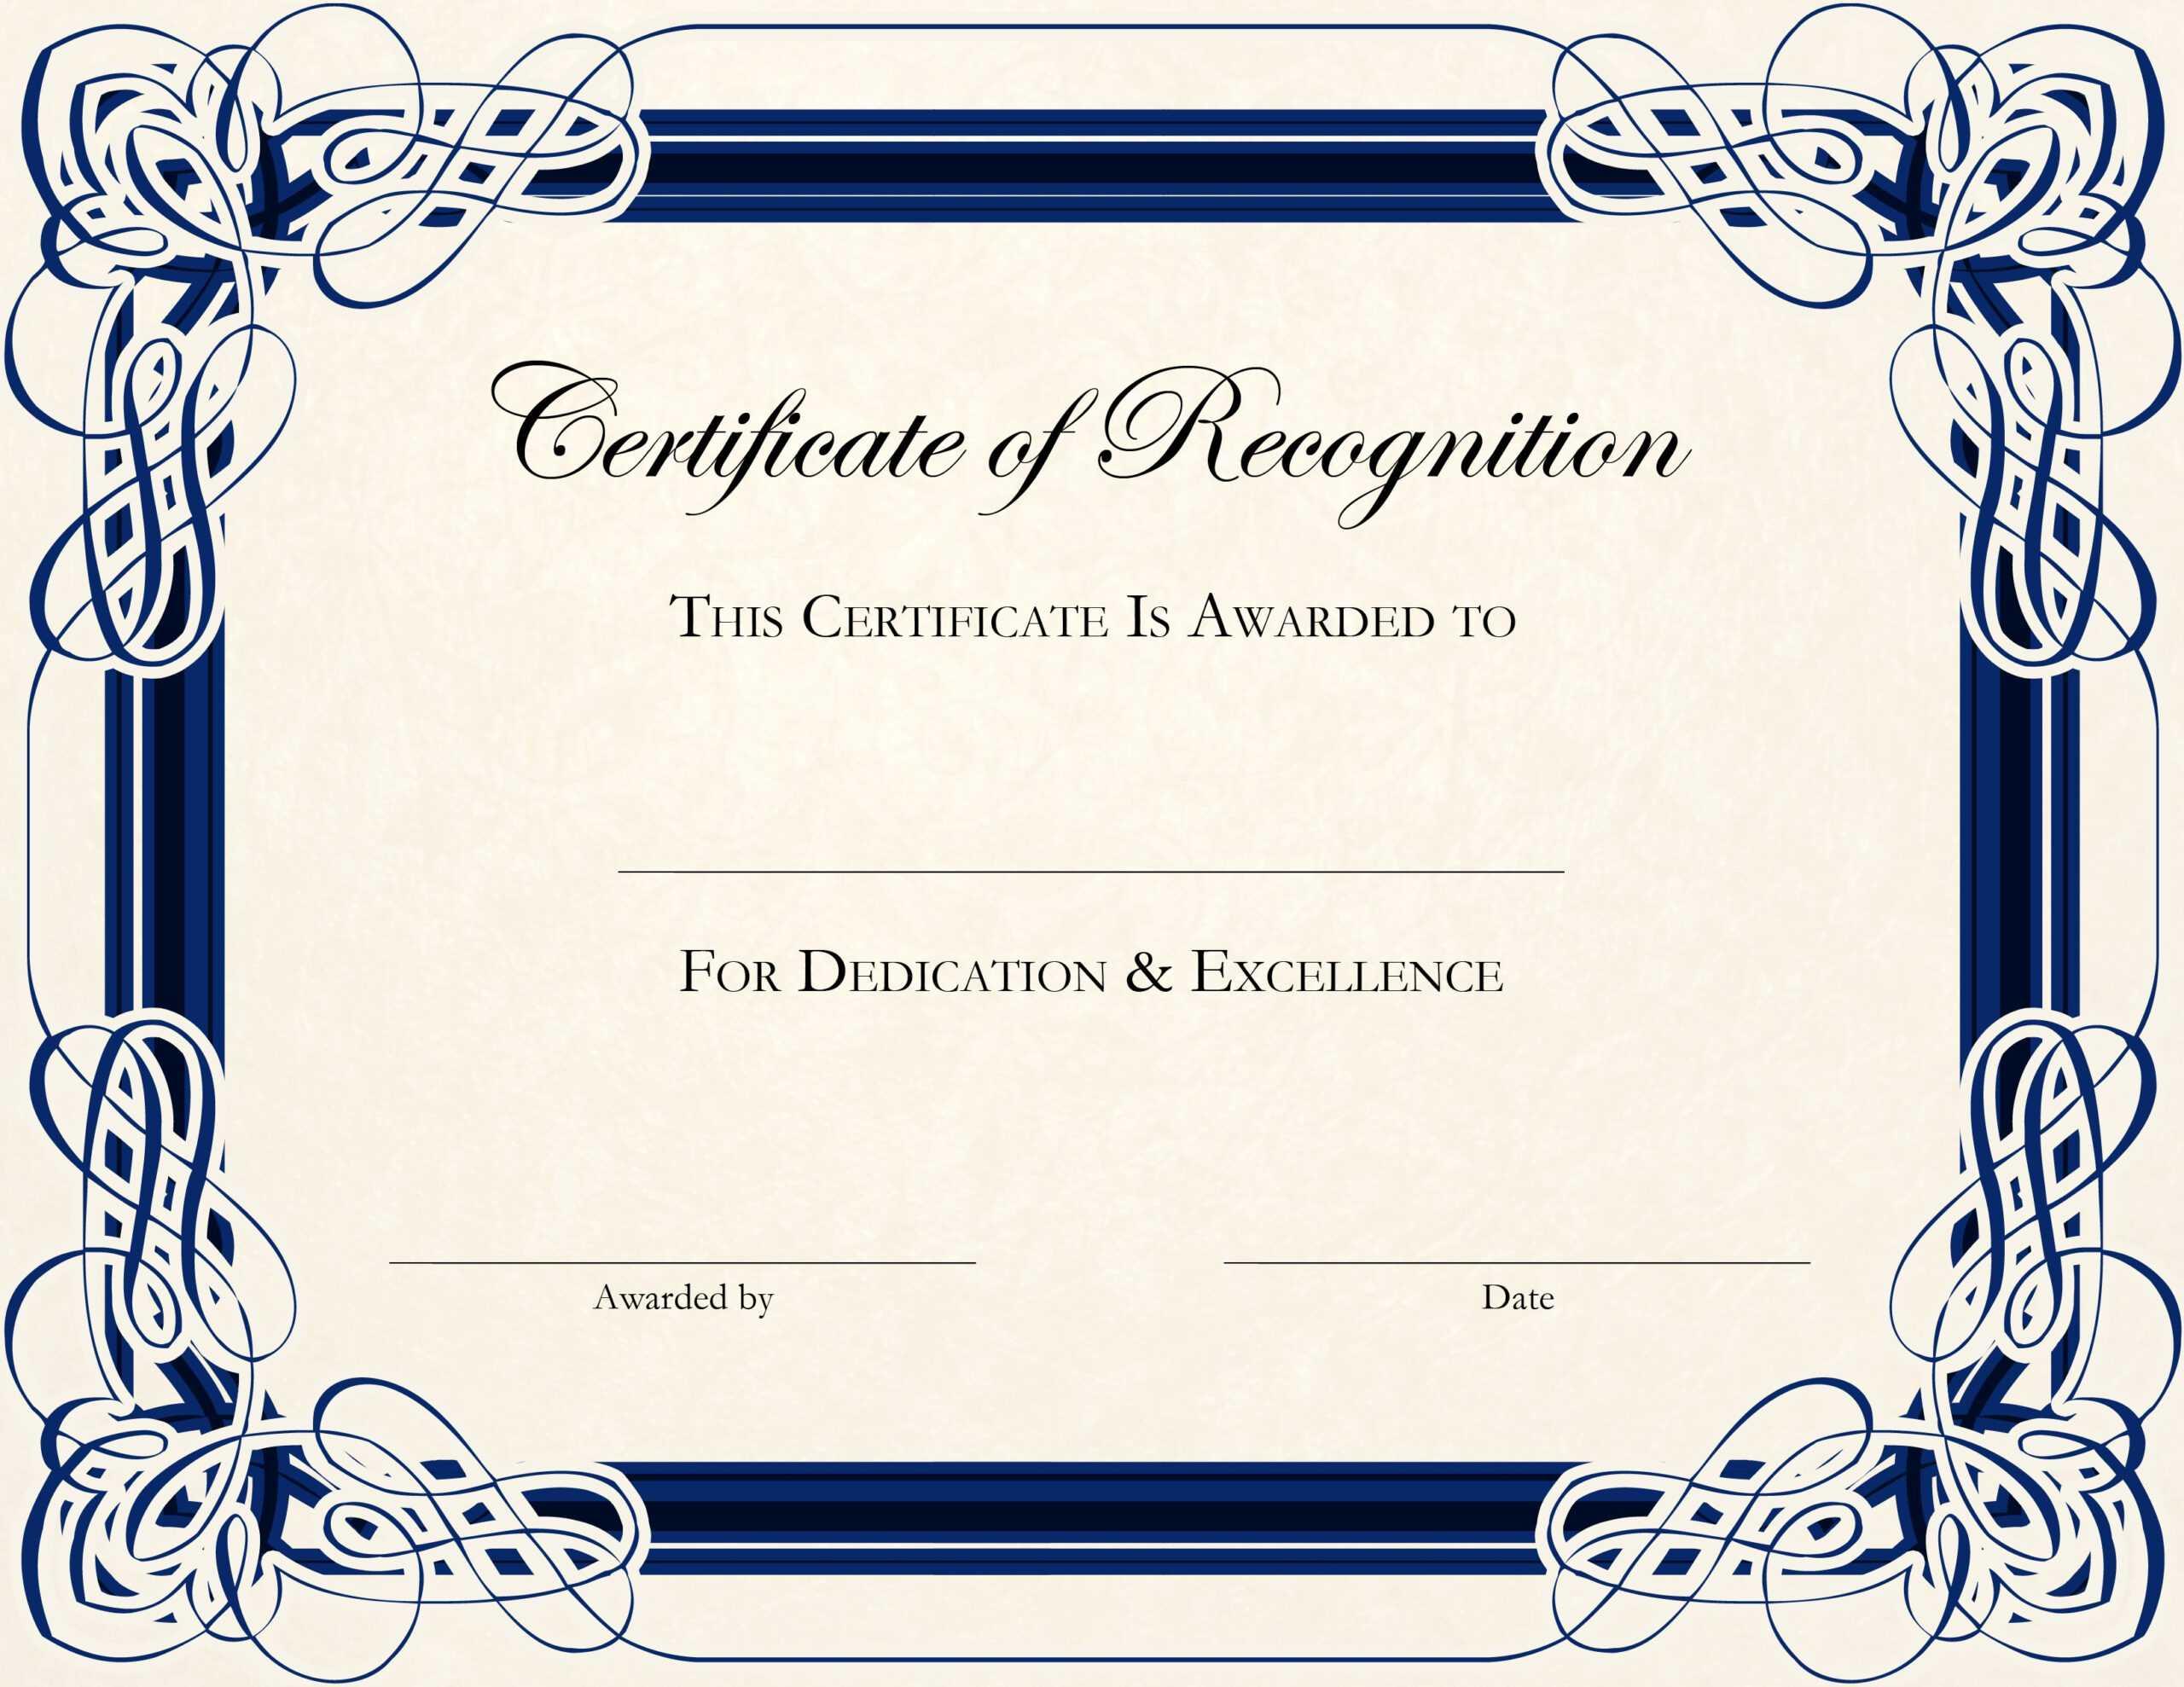 Anniversary Certificate Template Free - Karati.ald2014 With Regard To Anniversary Certificate Template Free